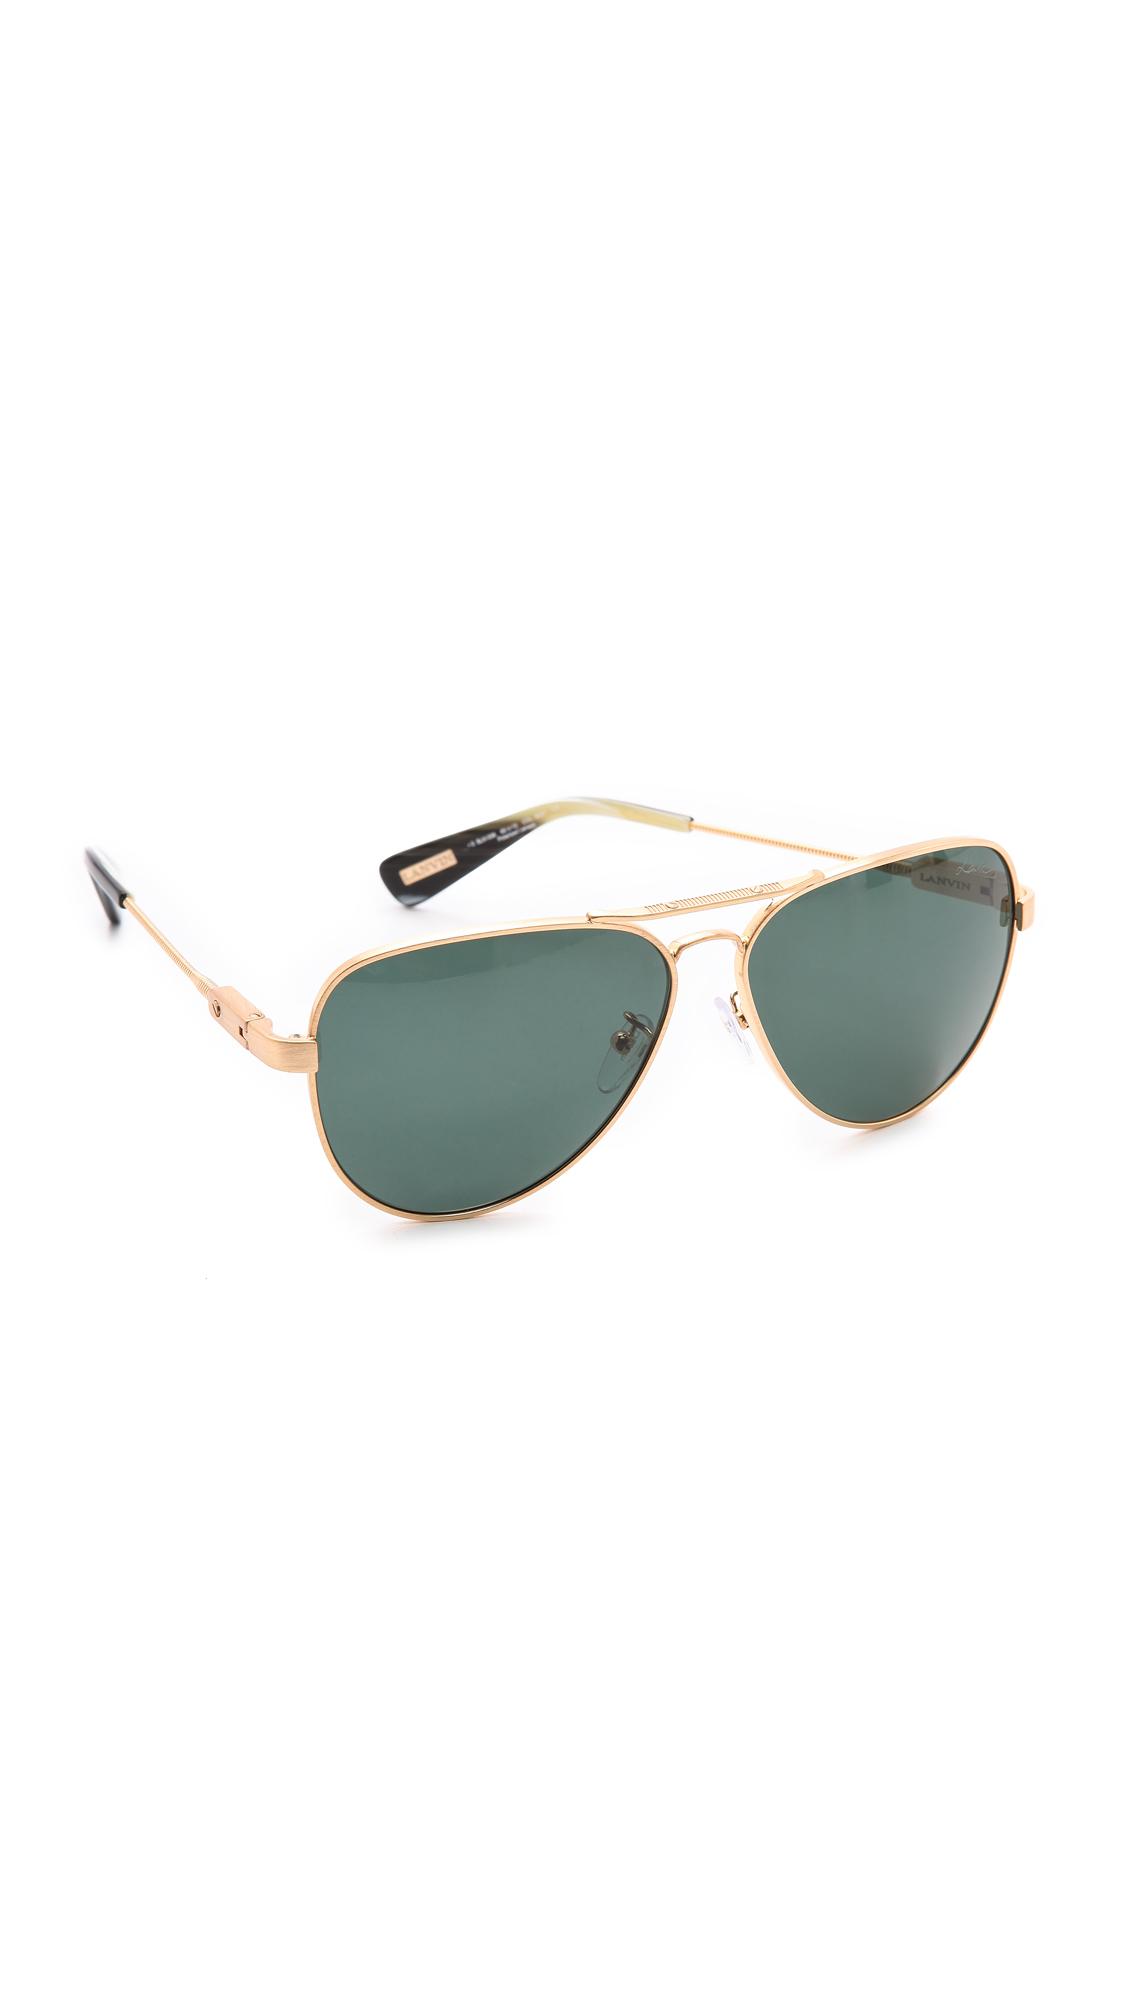 polarized aviator sunglasses 2017